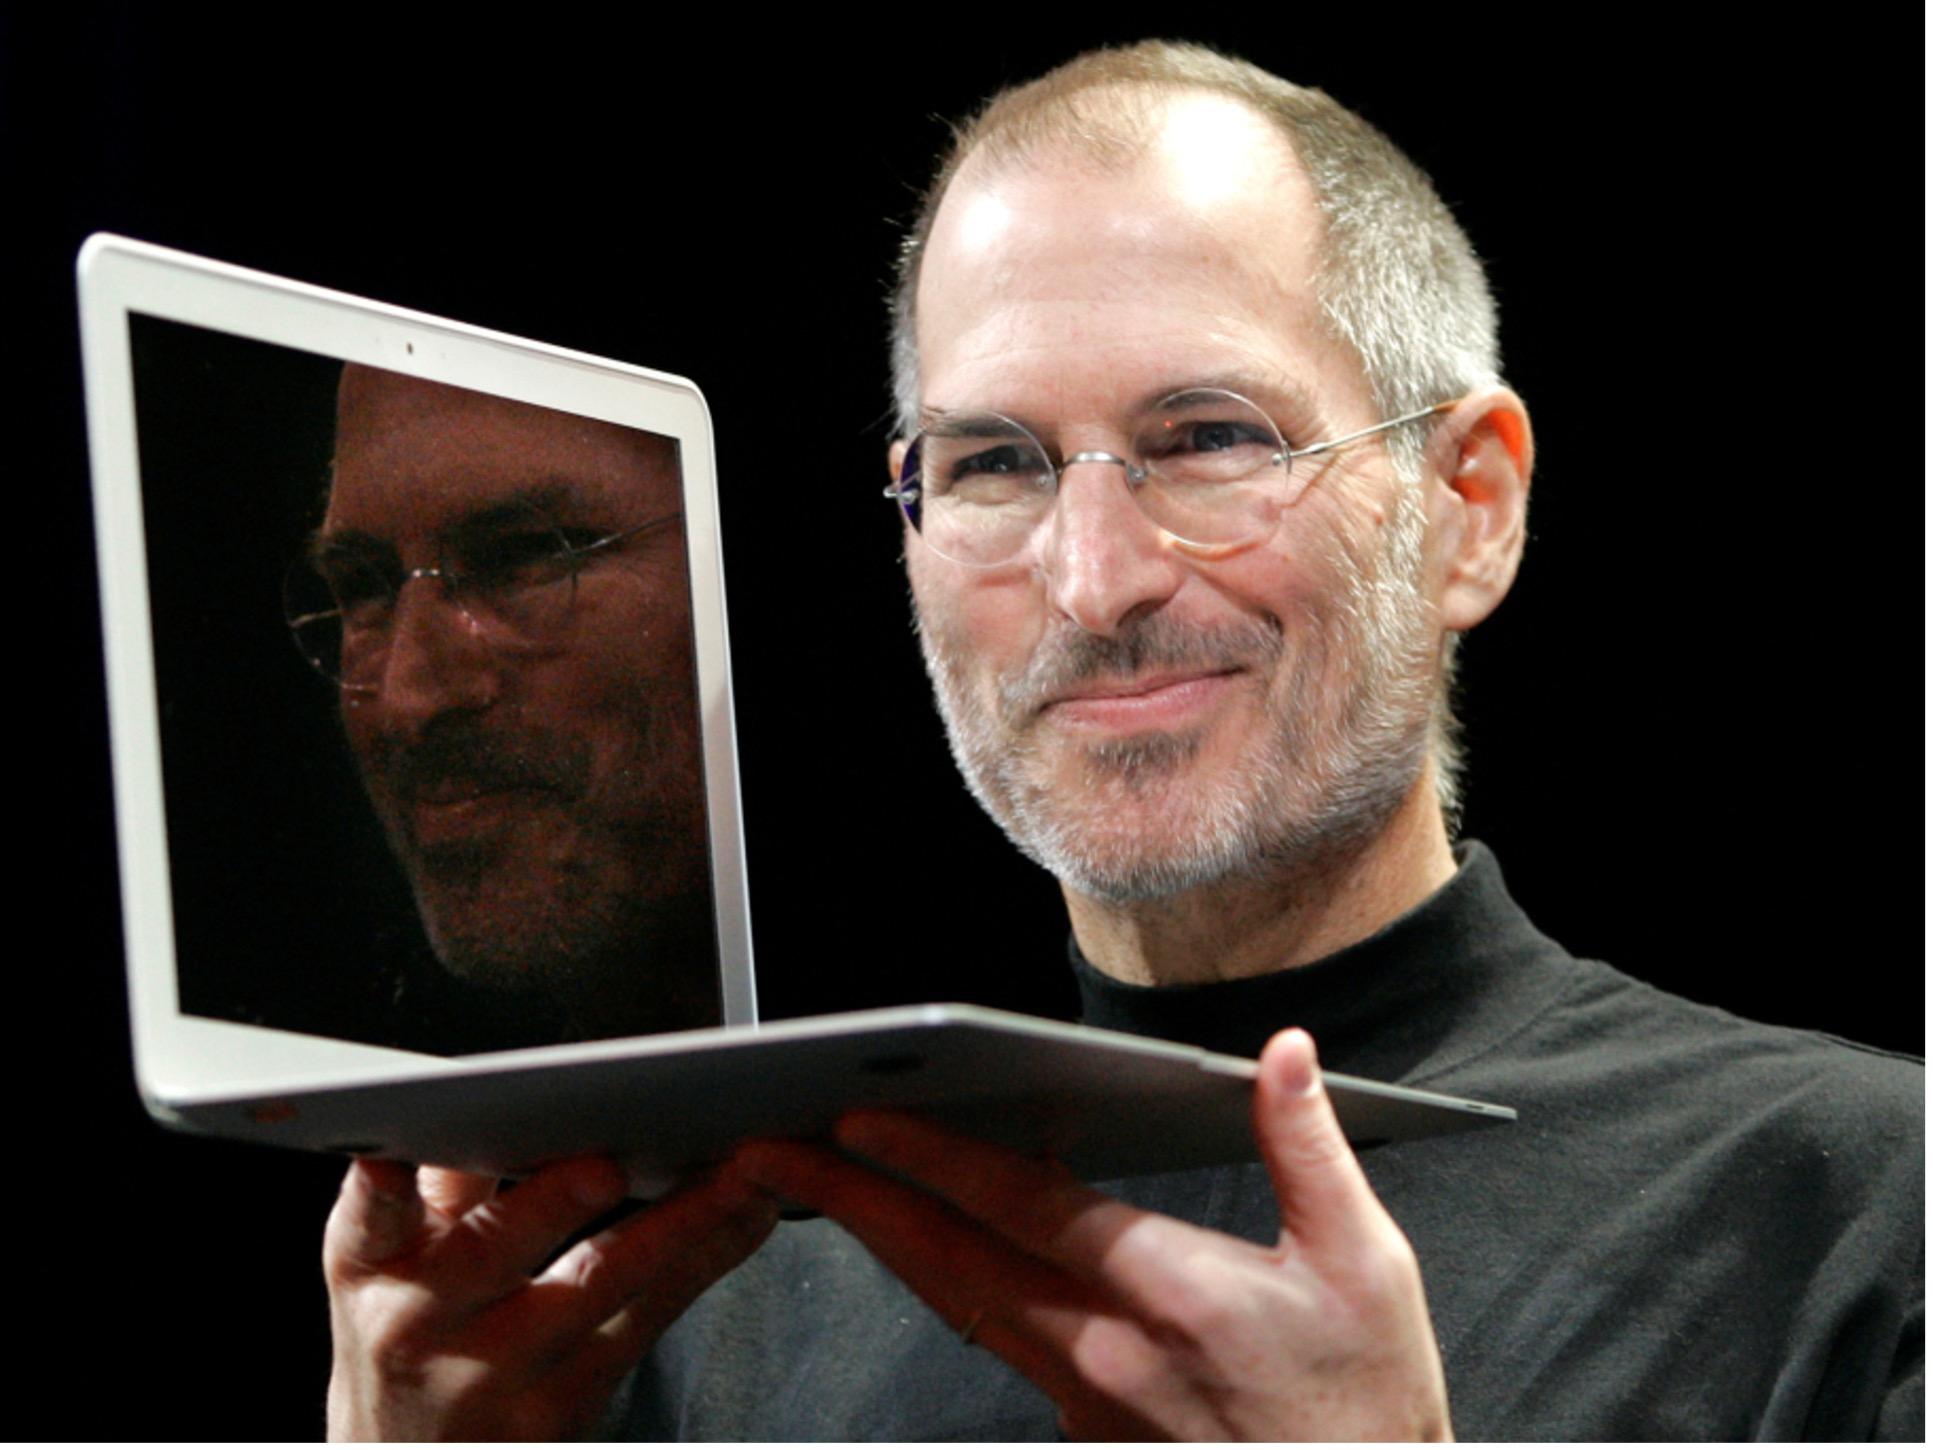 Apple Steve Jobs Holding a MacBook